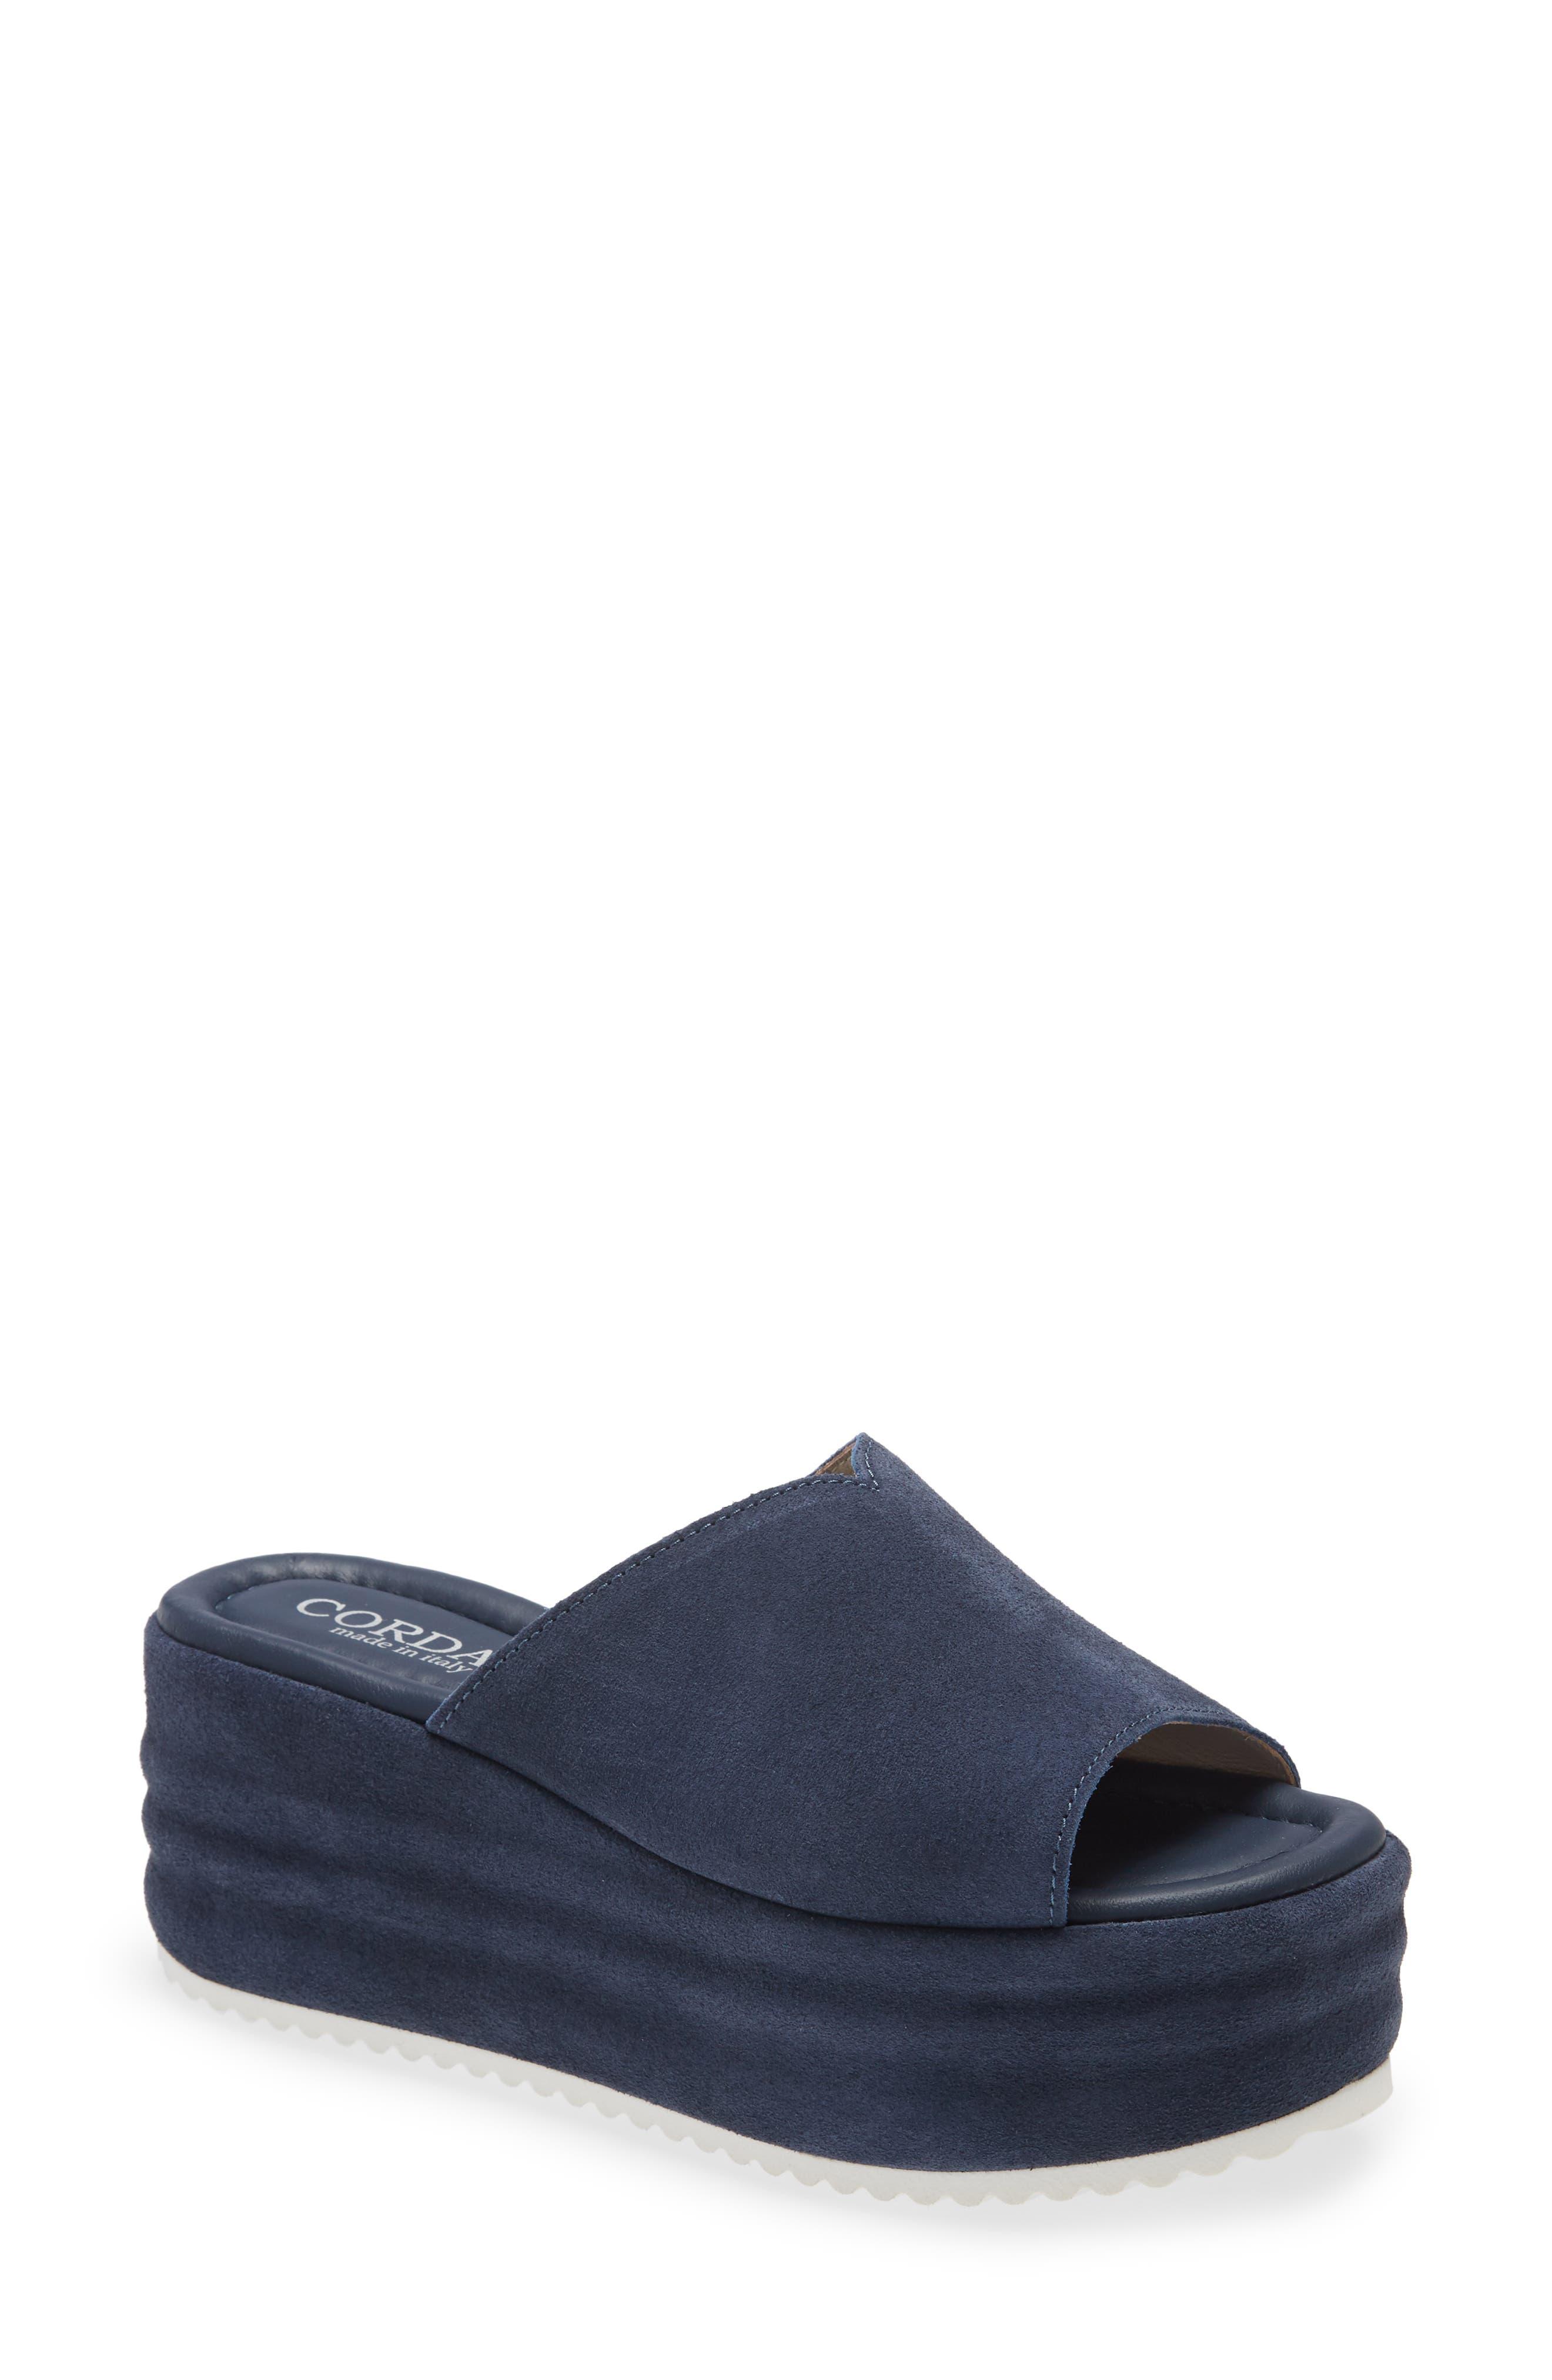 Yearn Platform Slide Sandal